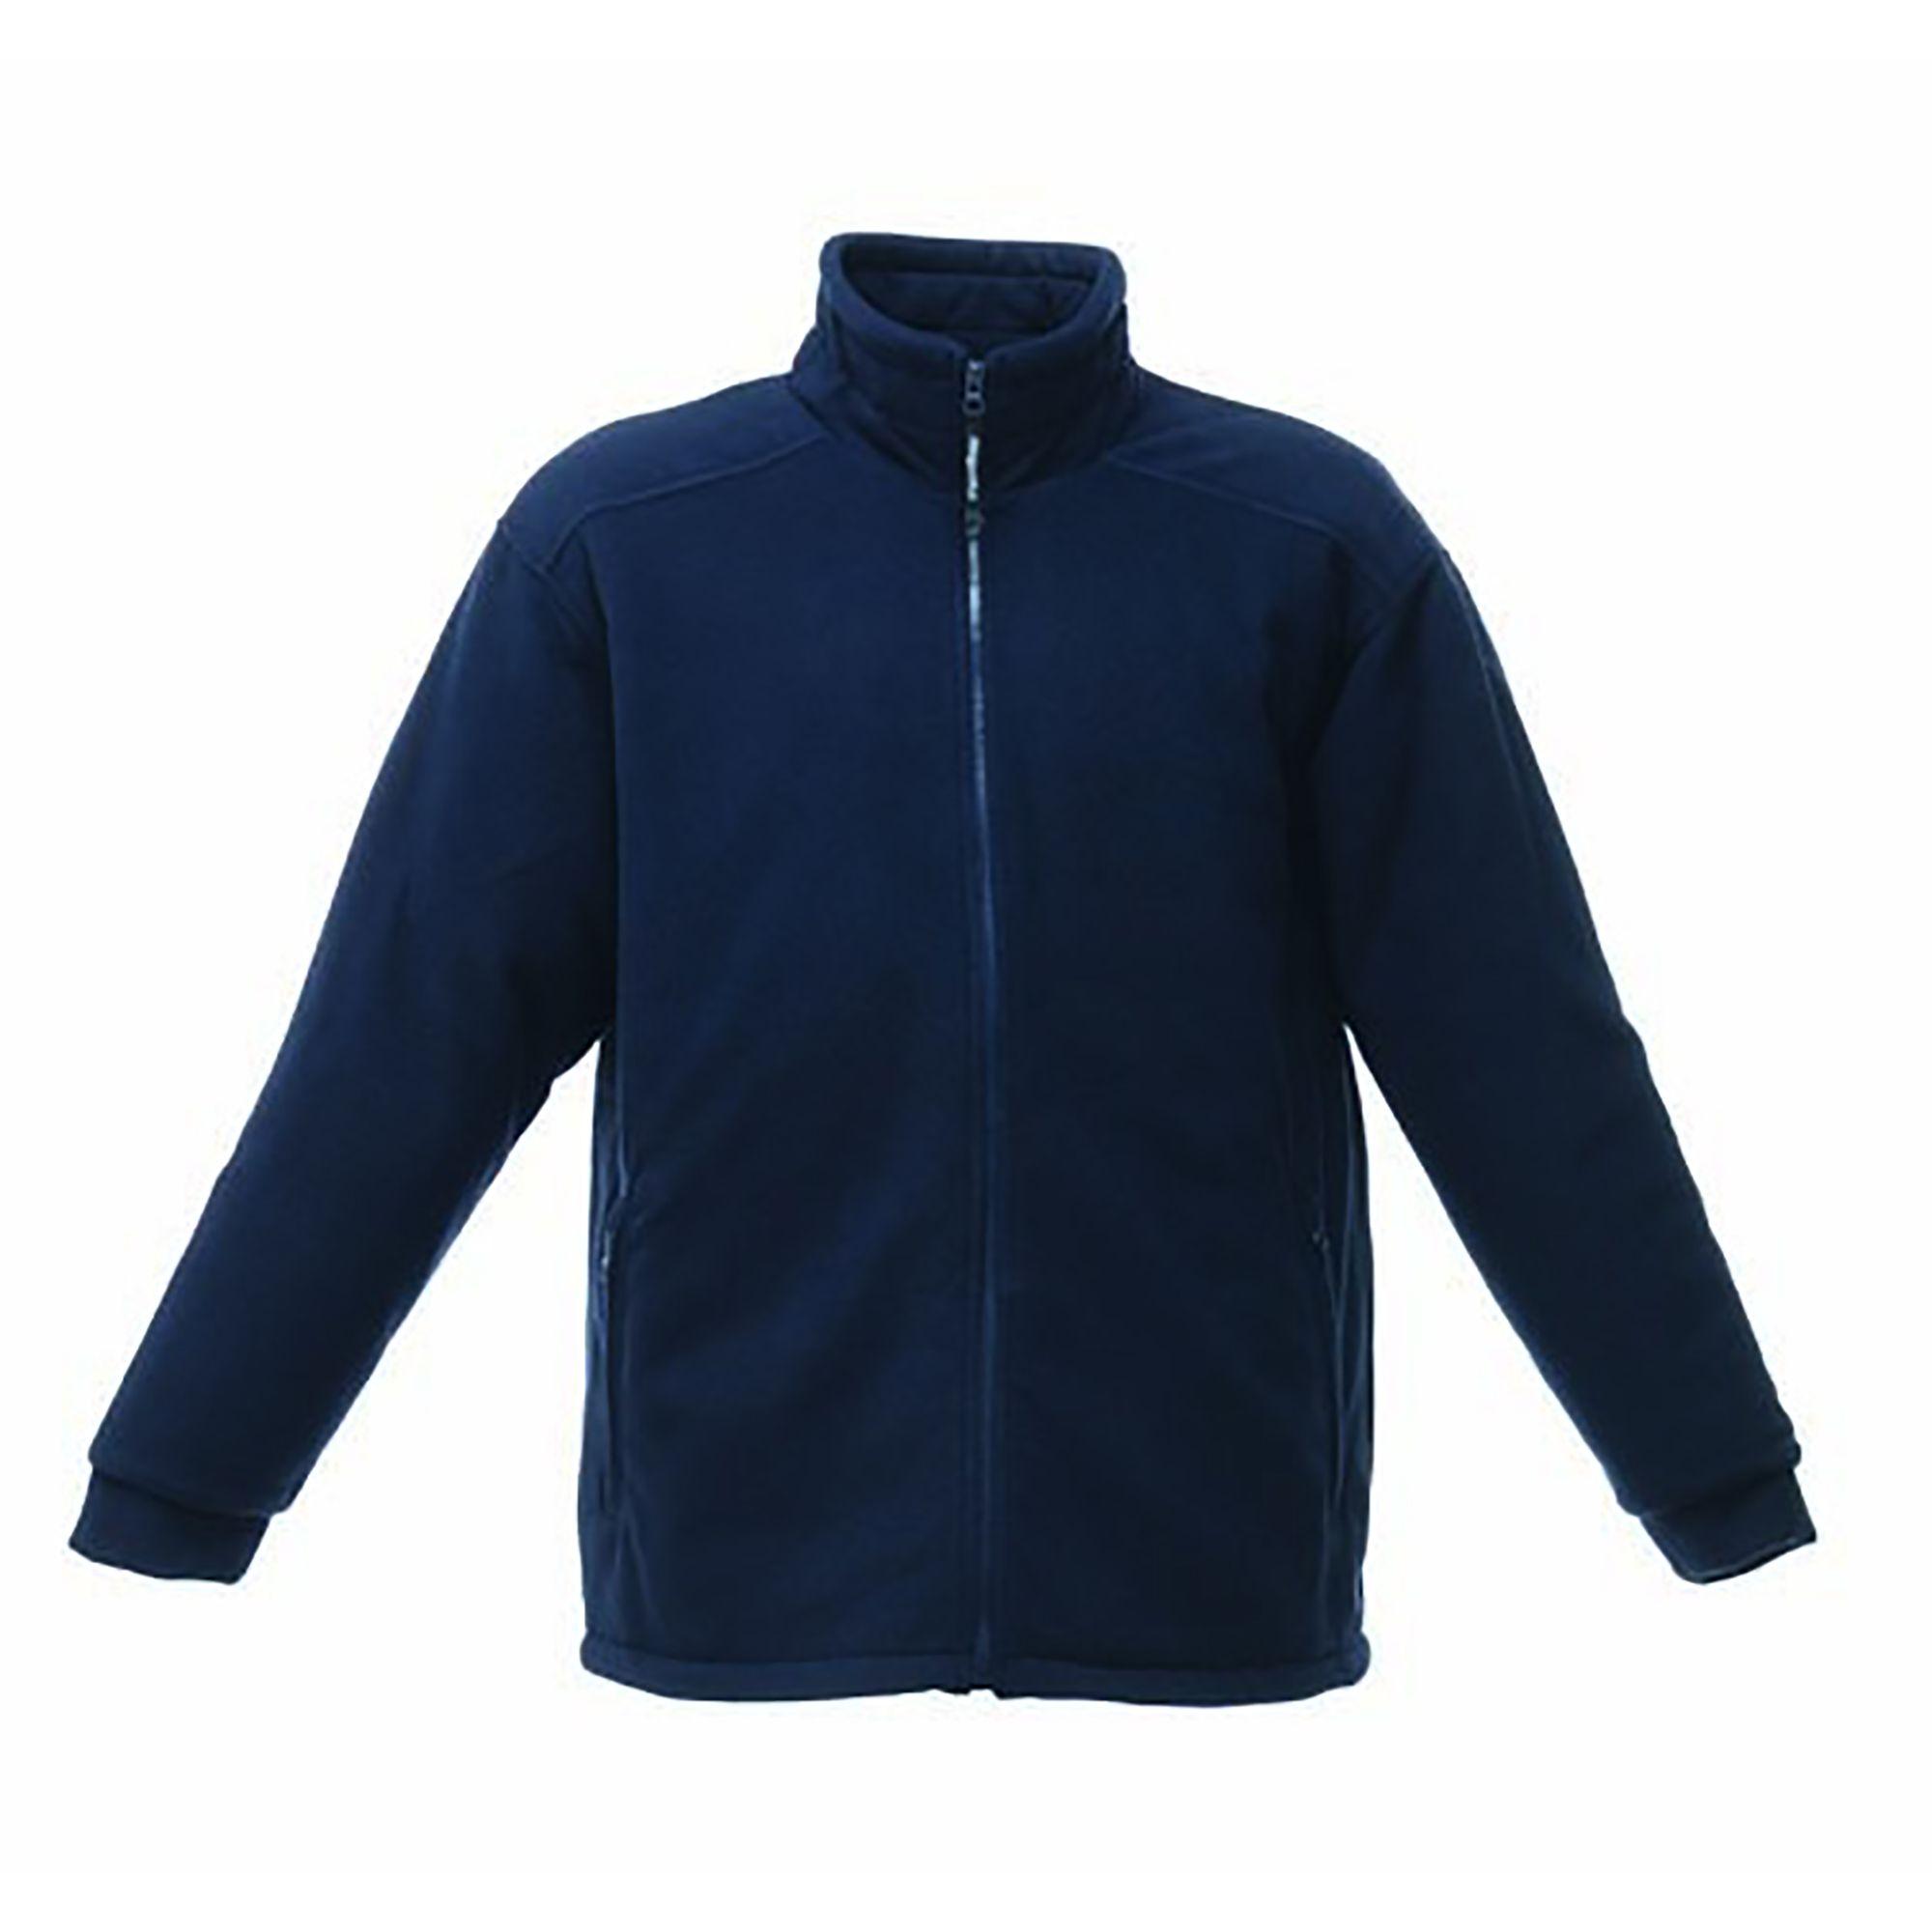 Regatta Great Outdoors Mens Asgard II Quilted Insulated Fleece Jacket